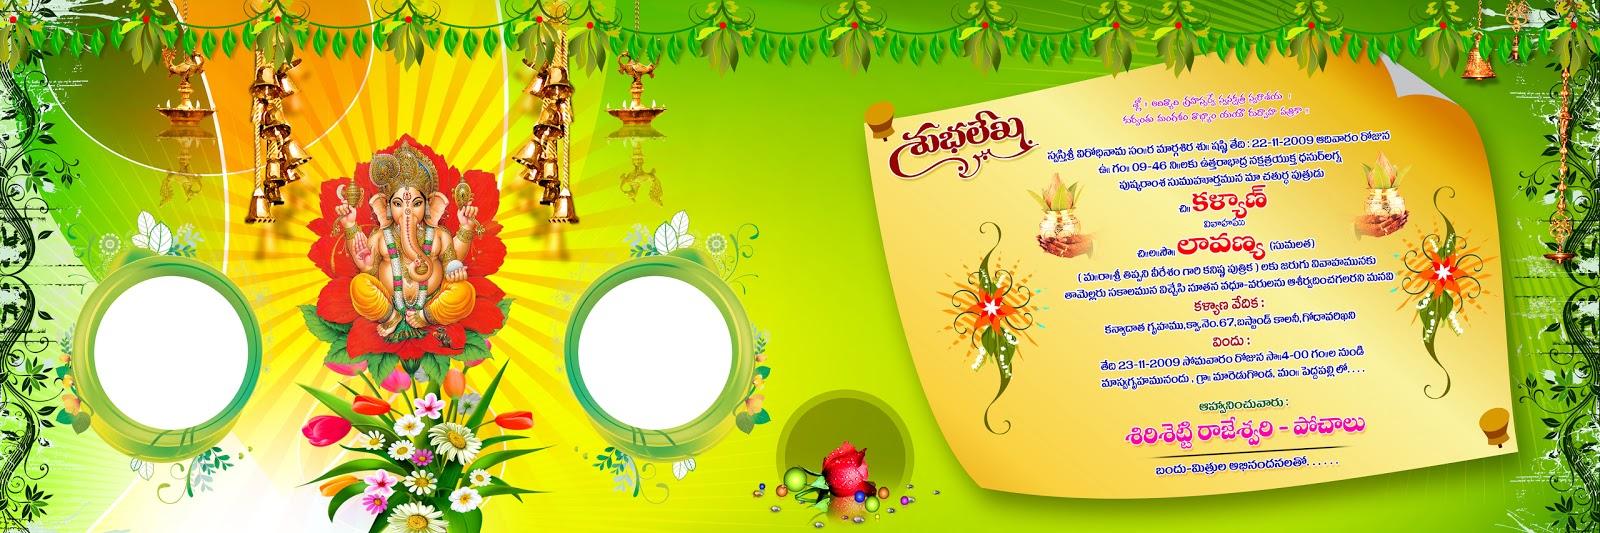 Wedding Card Designs Psd 12x36 Wedding Cards Designs